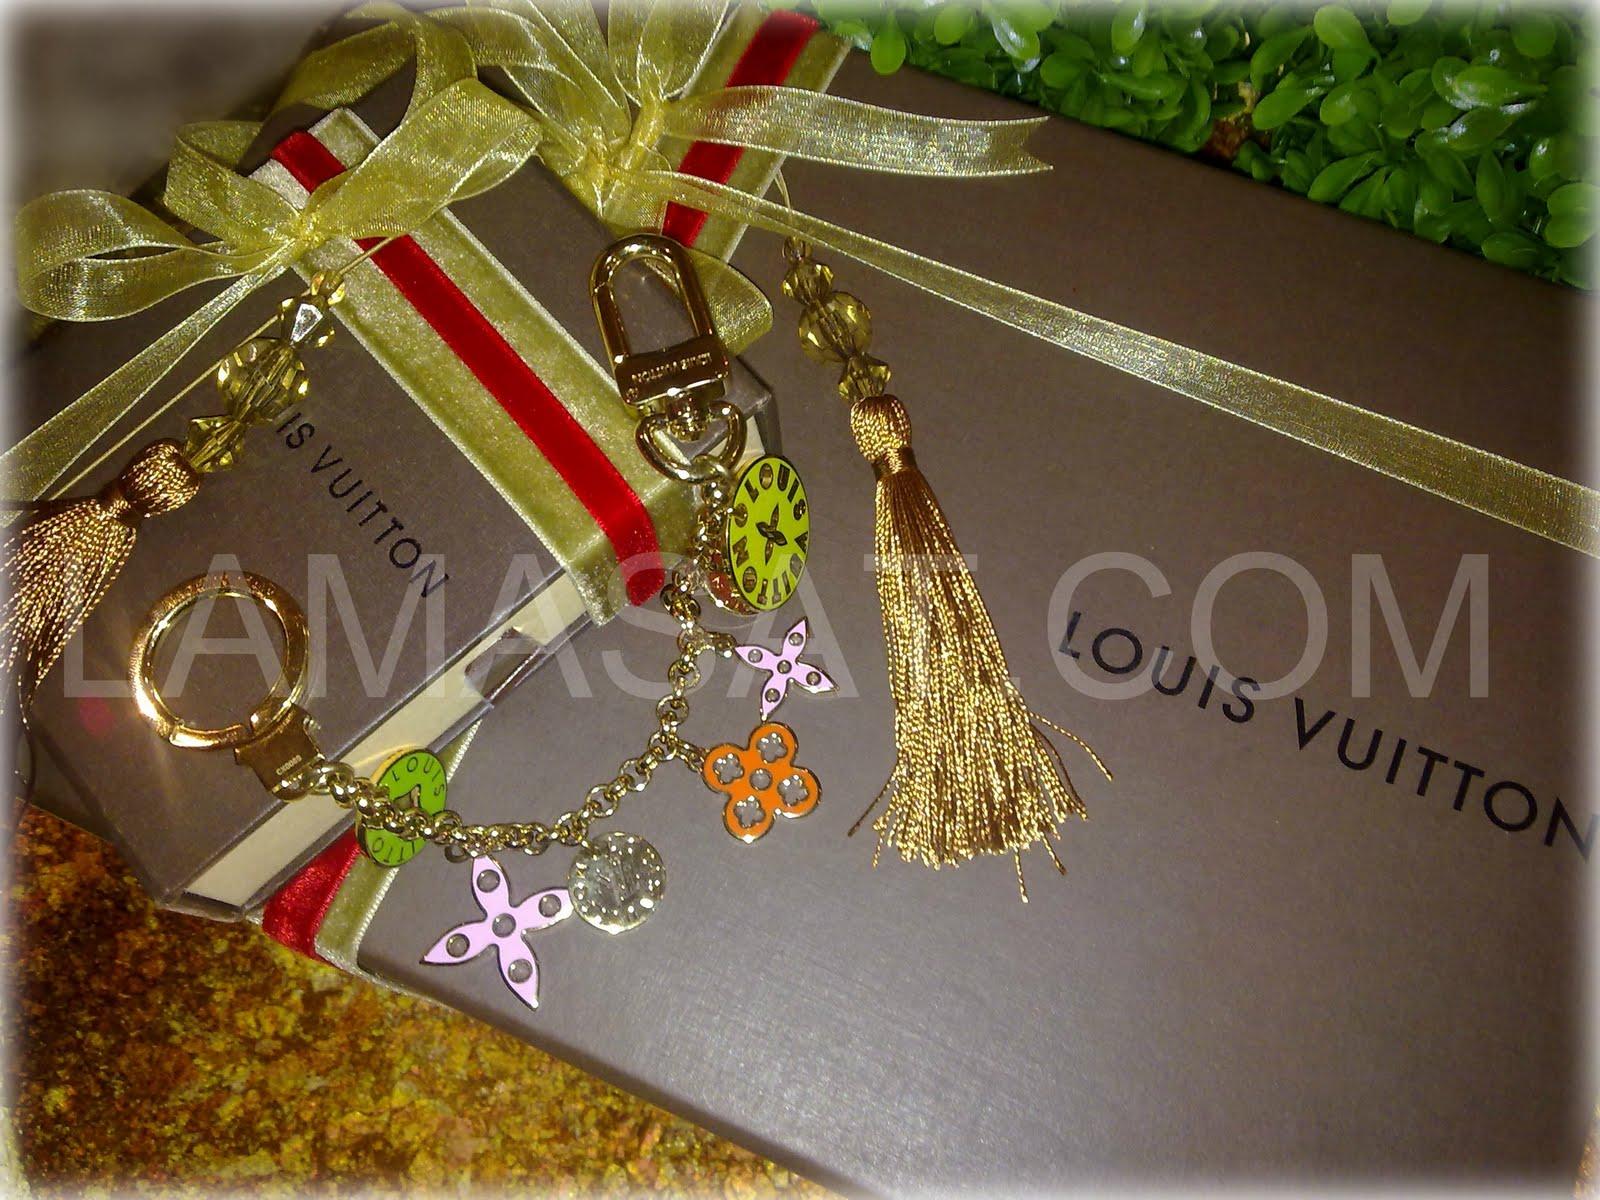 http://4.bp.blogspot.com/-1ol7s4pYF18/TjyClBBlgtI/AAAAAAAAADI/X-nYY6CauqQ/s1600/Louis+Vuitton+gift1.jpg